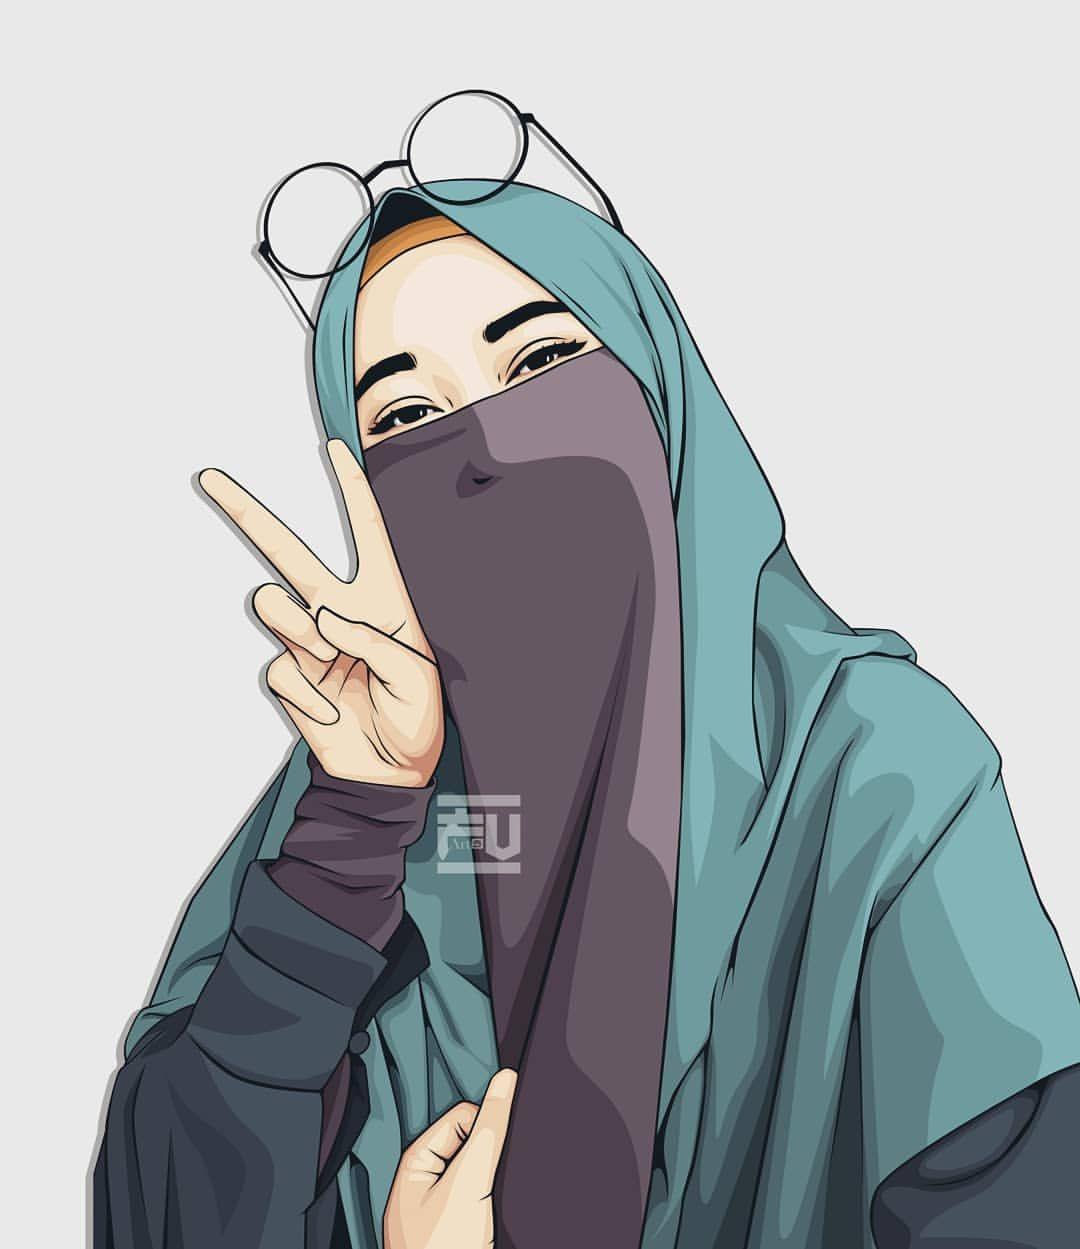 Anime Girl Gambar Anime Sedih Keren - KLICKSEHAT.CLUB